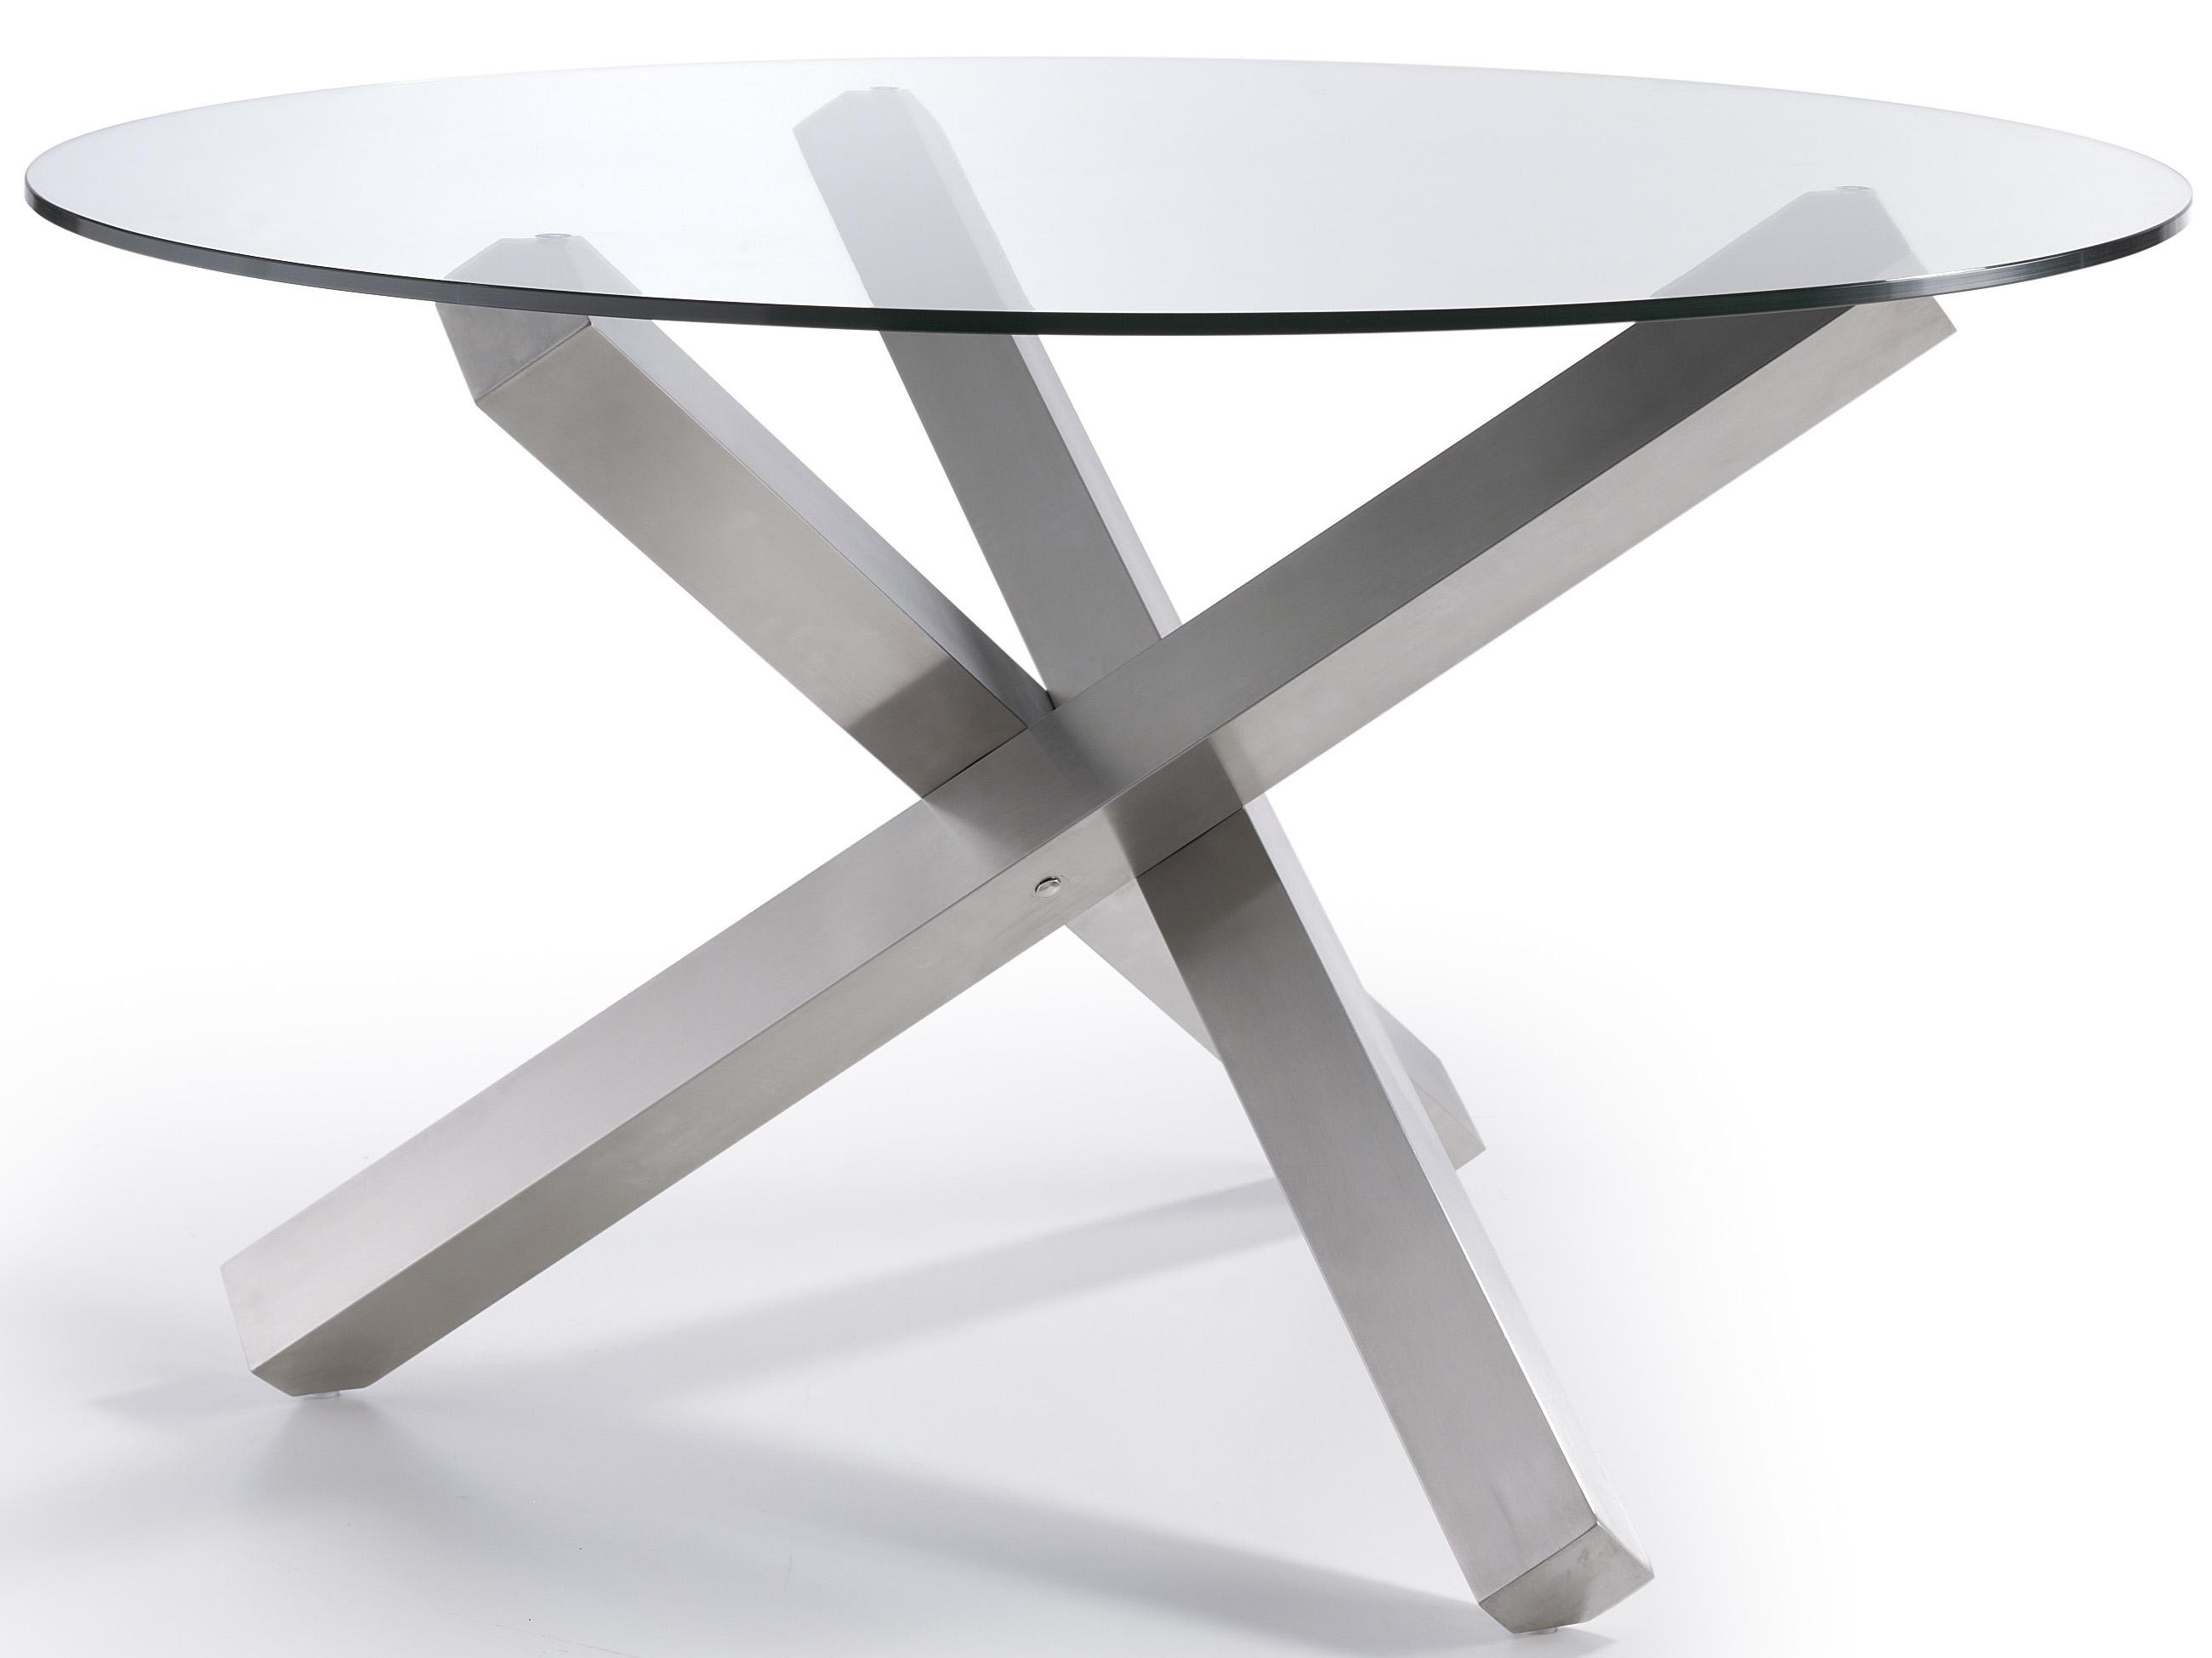 table ronde acier inoxydable poli et verre tremp croiza dimensions d 110 x h 76 cm. Black Bedroom Furniture Sets. Home Design Ideas